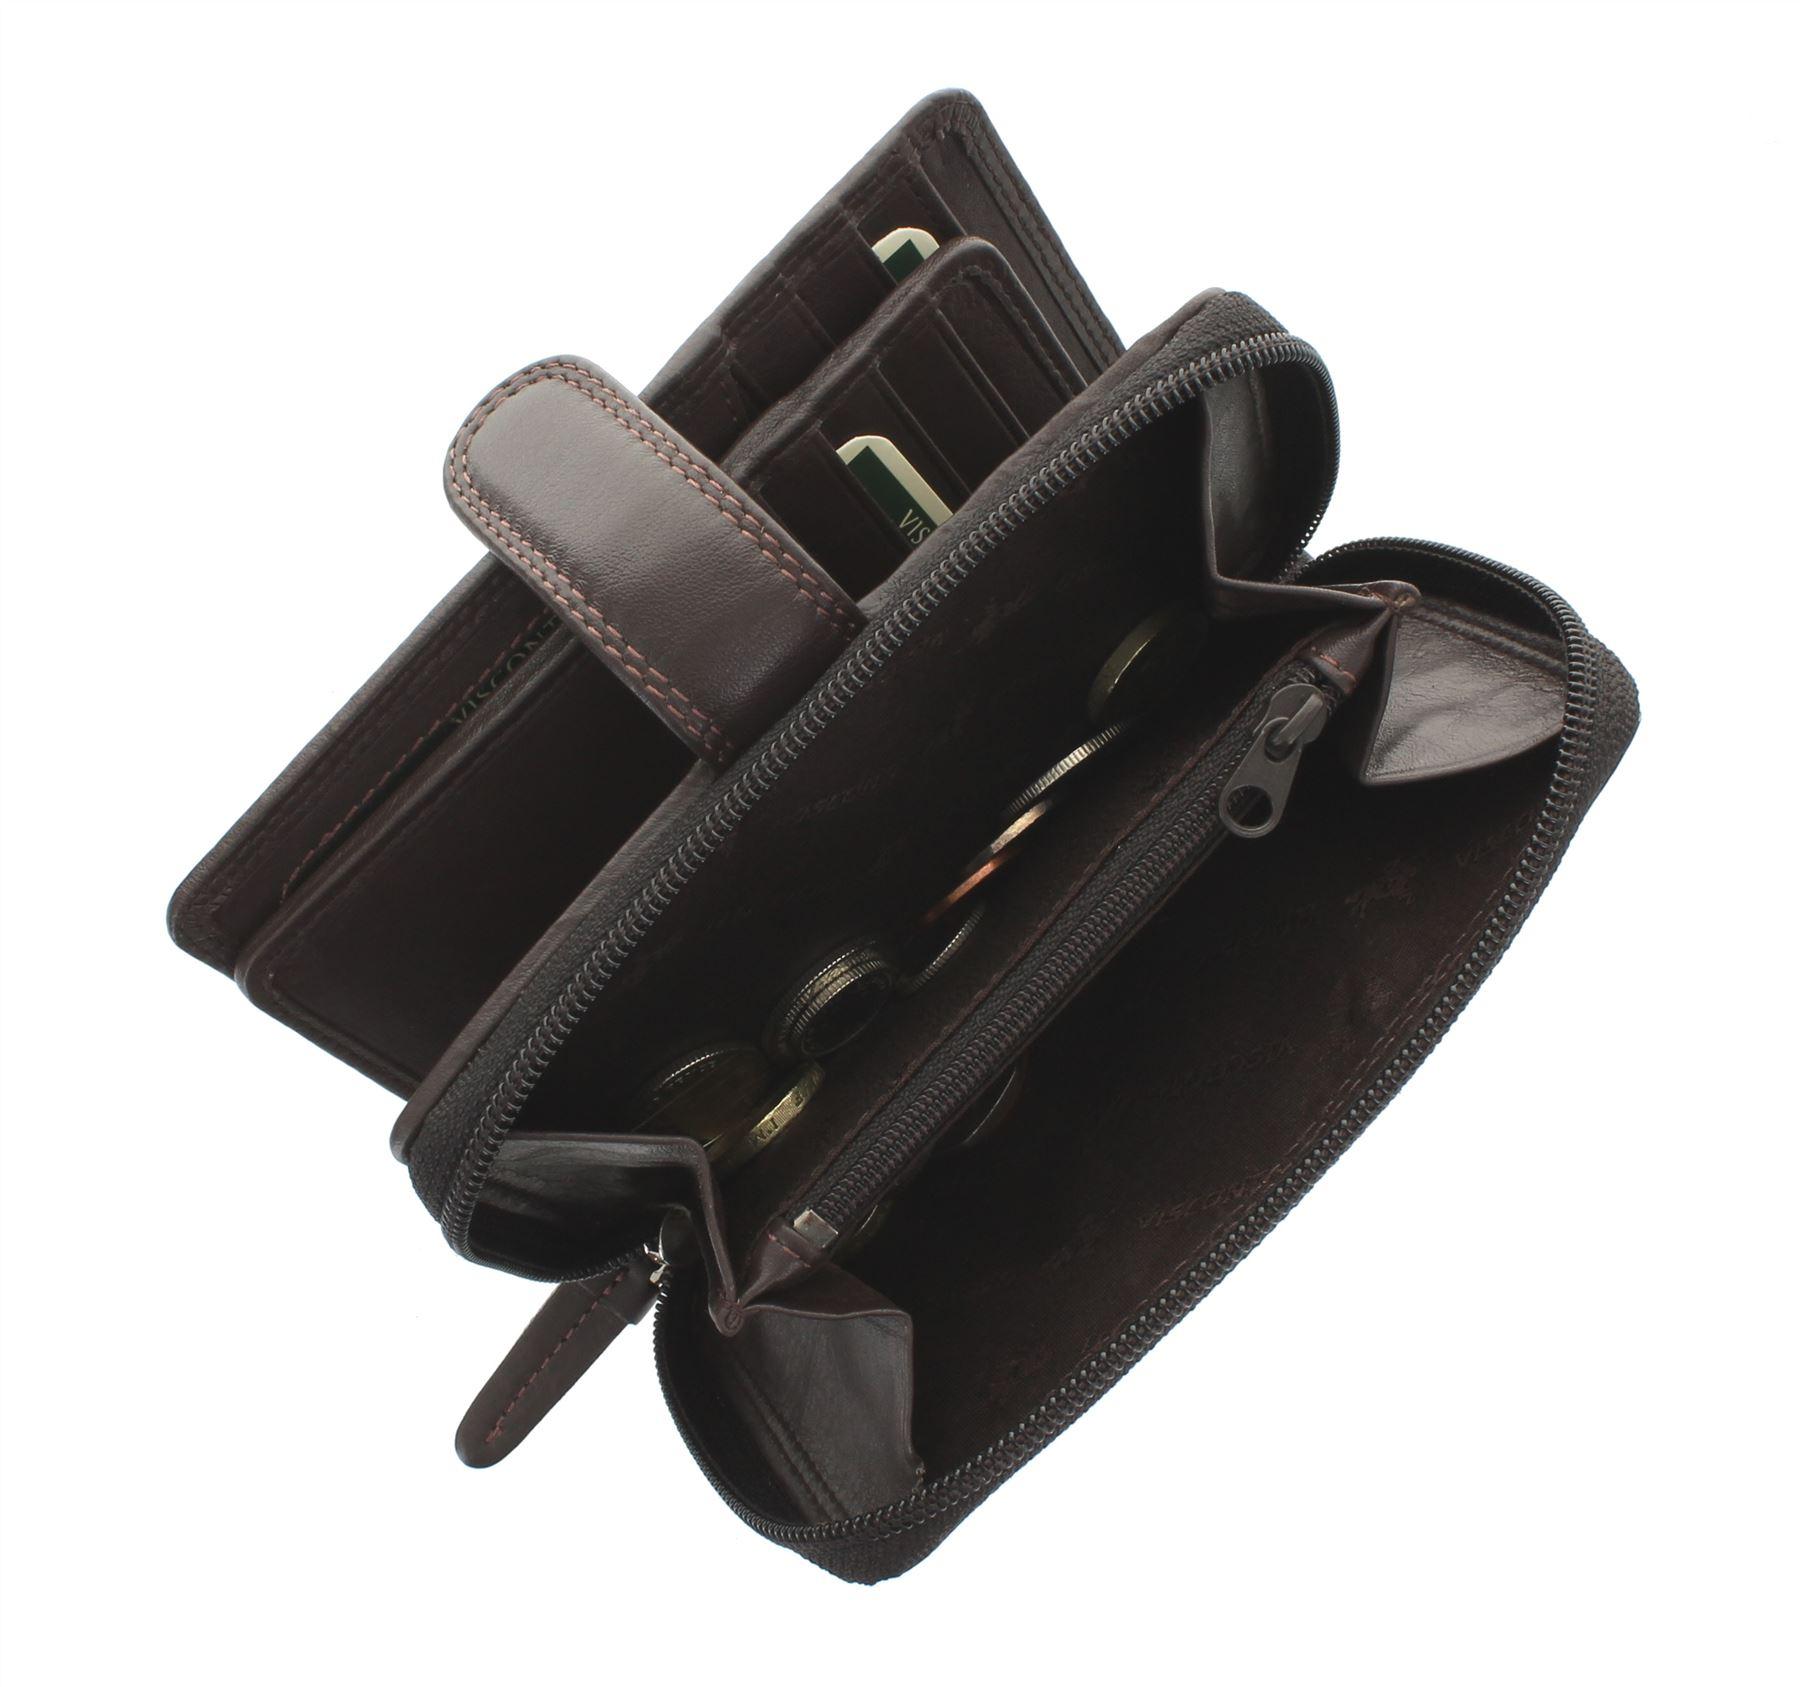 Visconti-Heritage-Collection-MADAME-Leather-Purse-Tab-Closure-RFID-blocking-HT33 miniatura 11